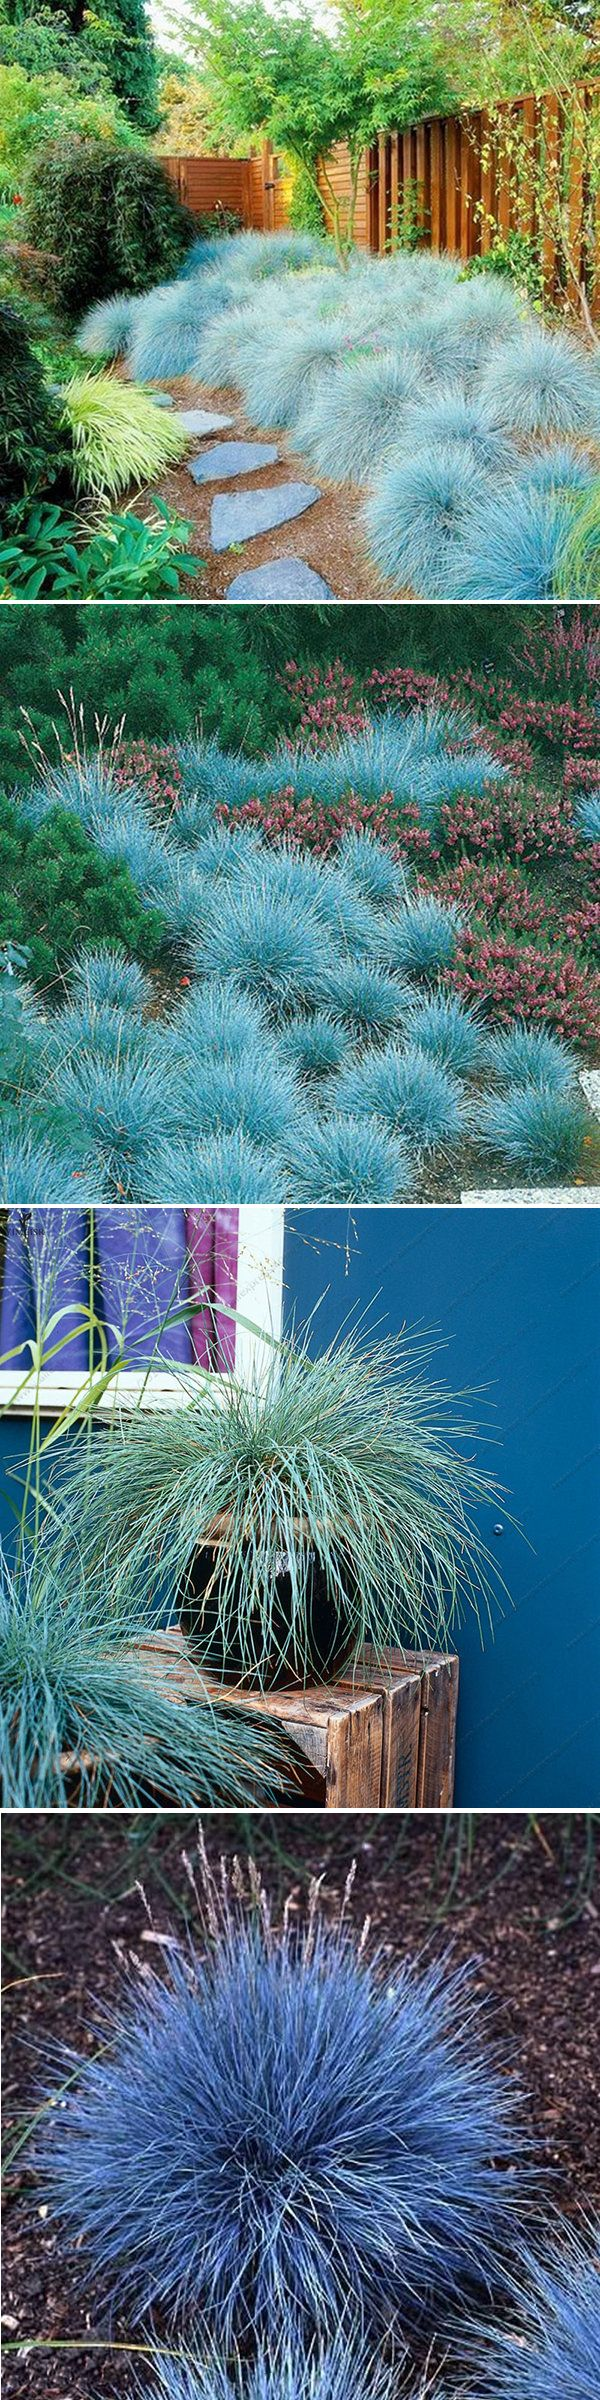 Best way to plant grass seed - 100pcs Blue Fescue Grass Seeds Perennial Hardy Ornamental Grass Home Garden